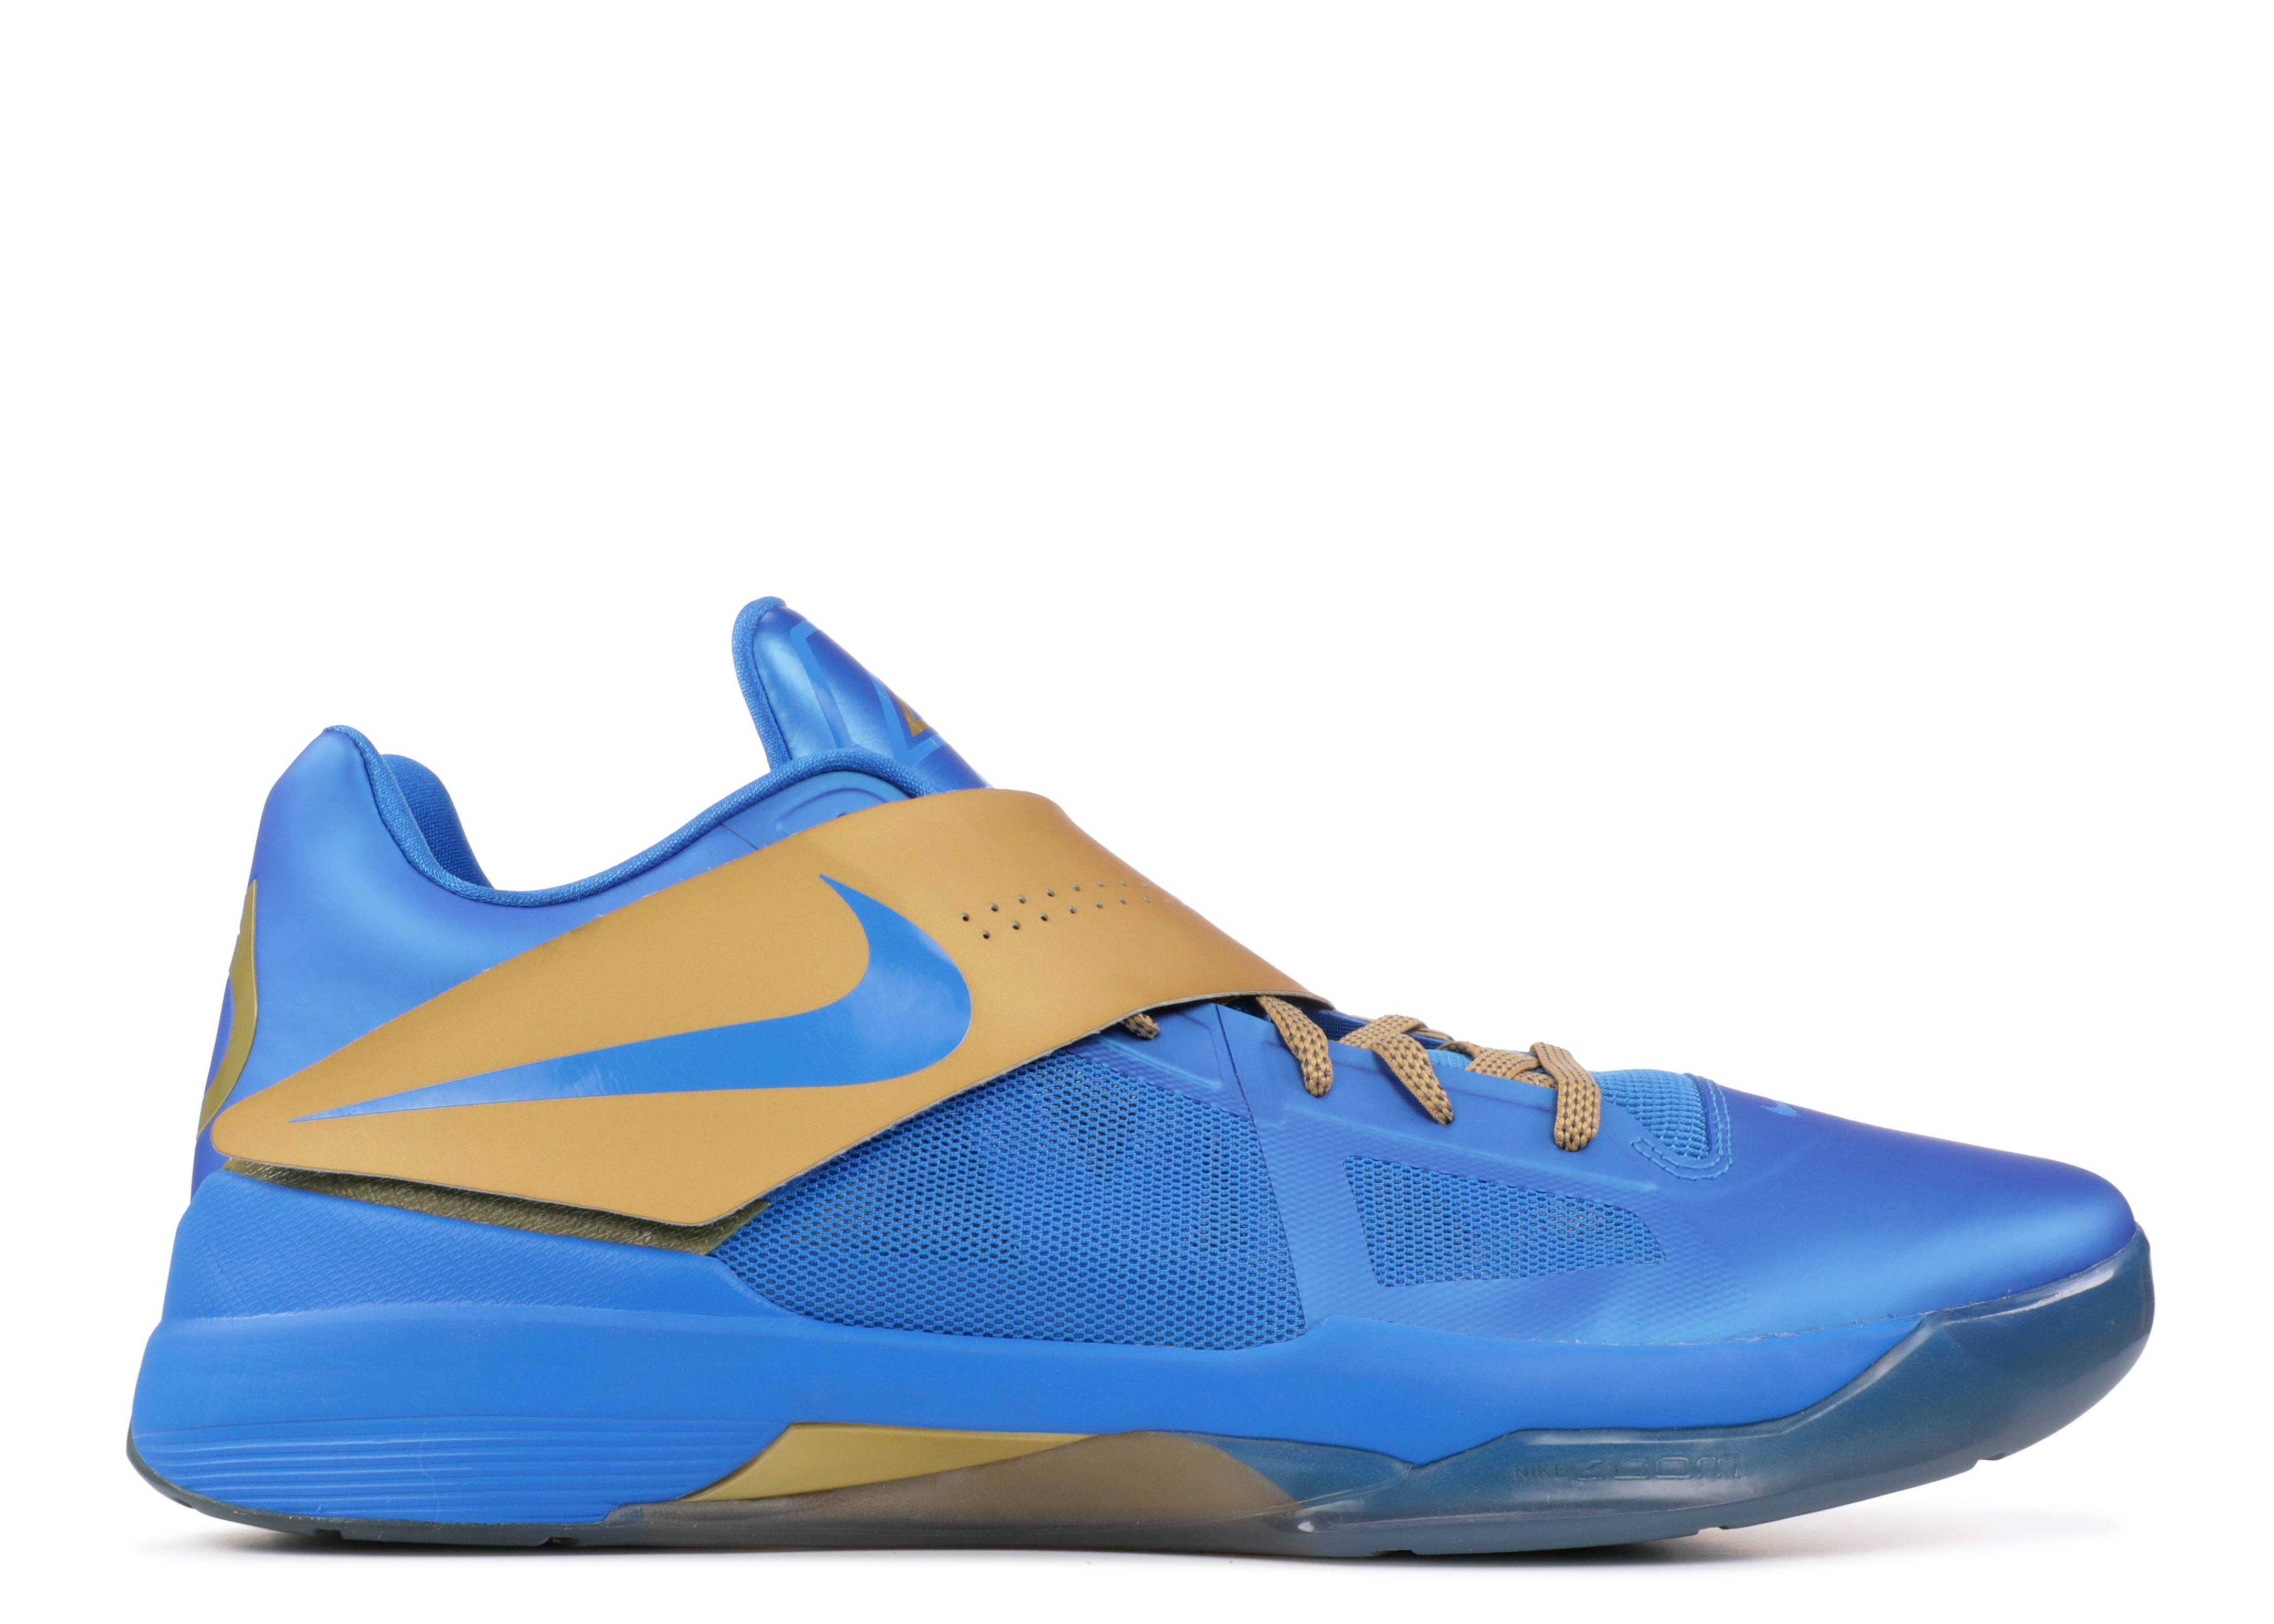 8d568ffc8e78b7 Nike Zoom Kd 4 Pe - Nike - mnbskt 985 316337 - photo blue metgold-togagne